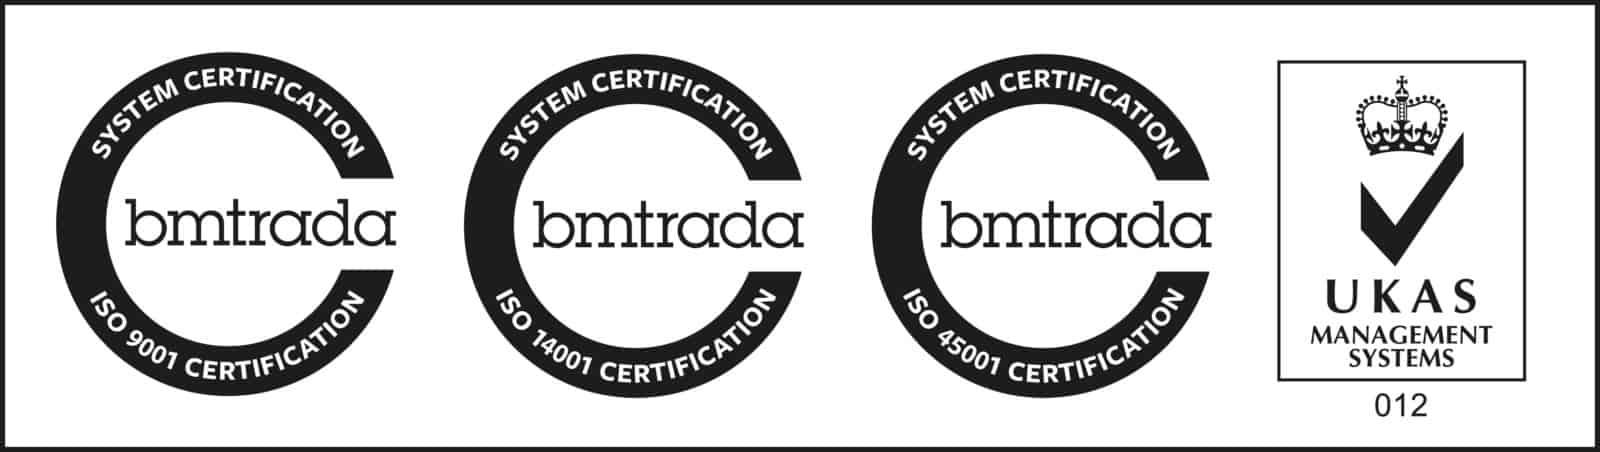 ISO 9001 & ISO 45001 & ISO 14001